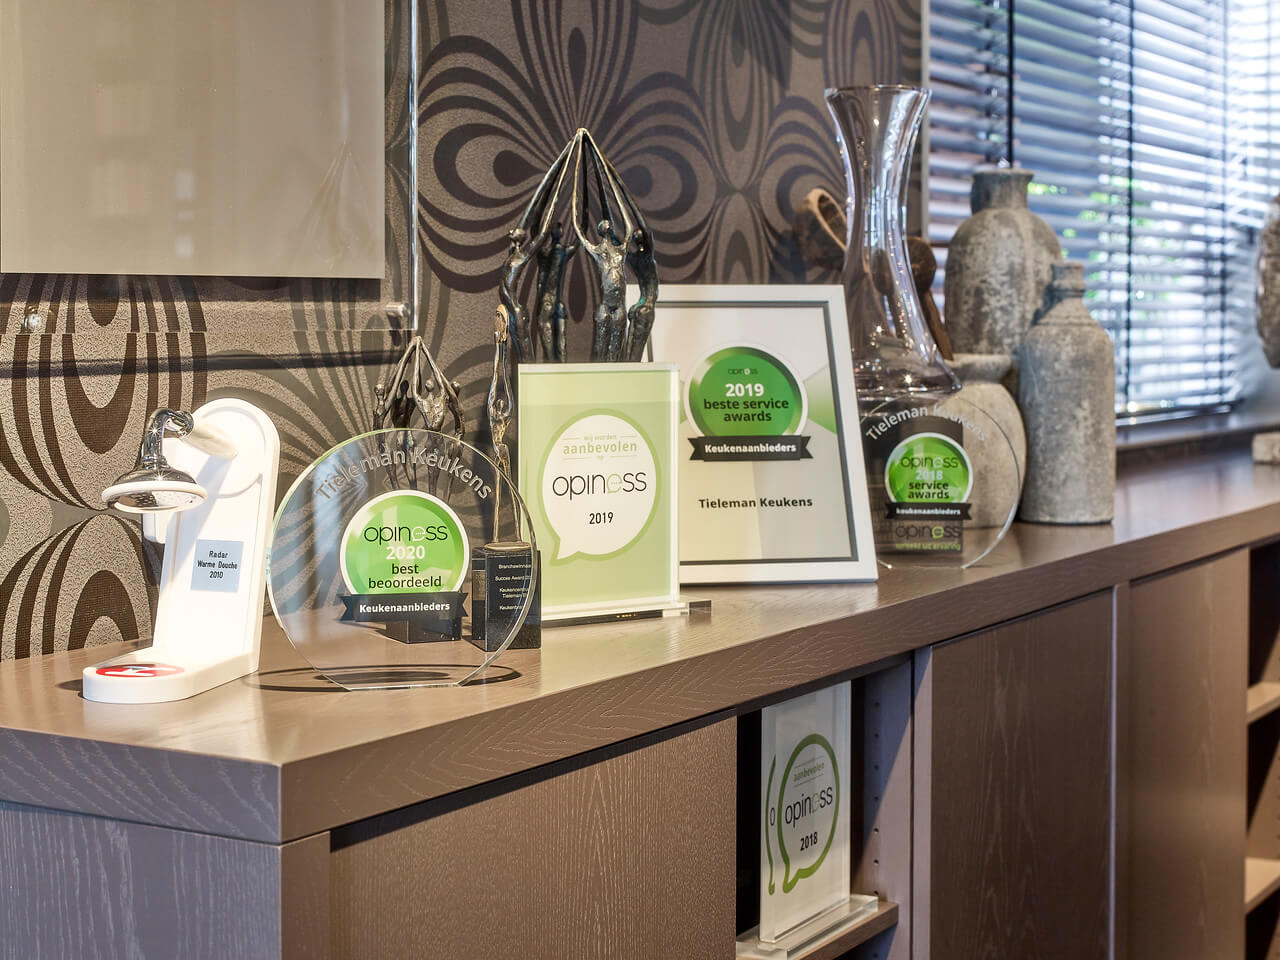 Awards onderscheidingen Tieleman Keukens